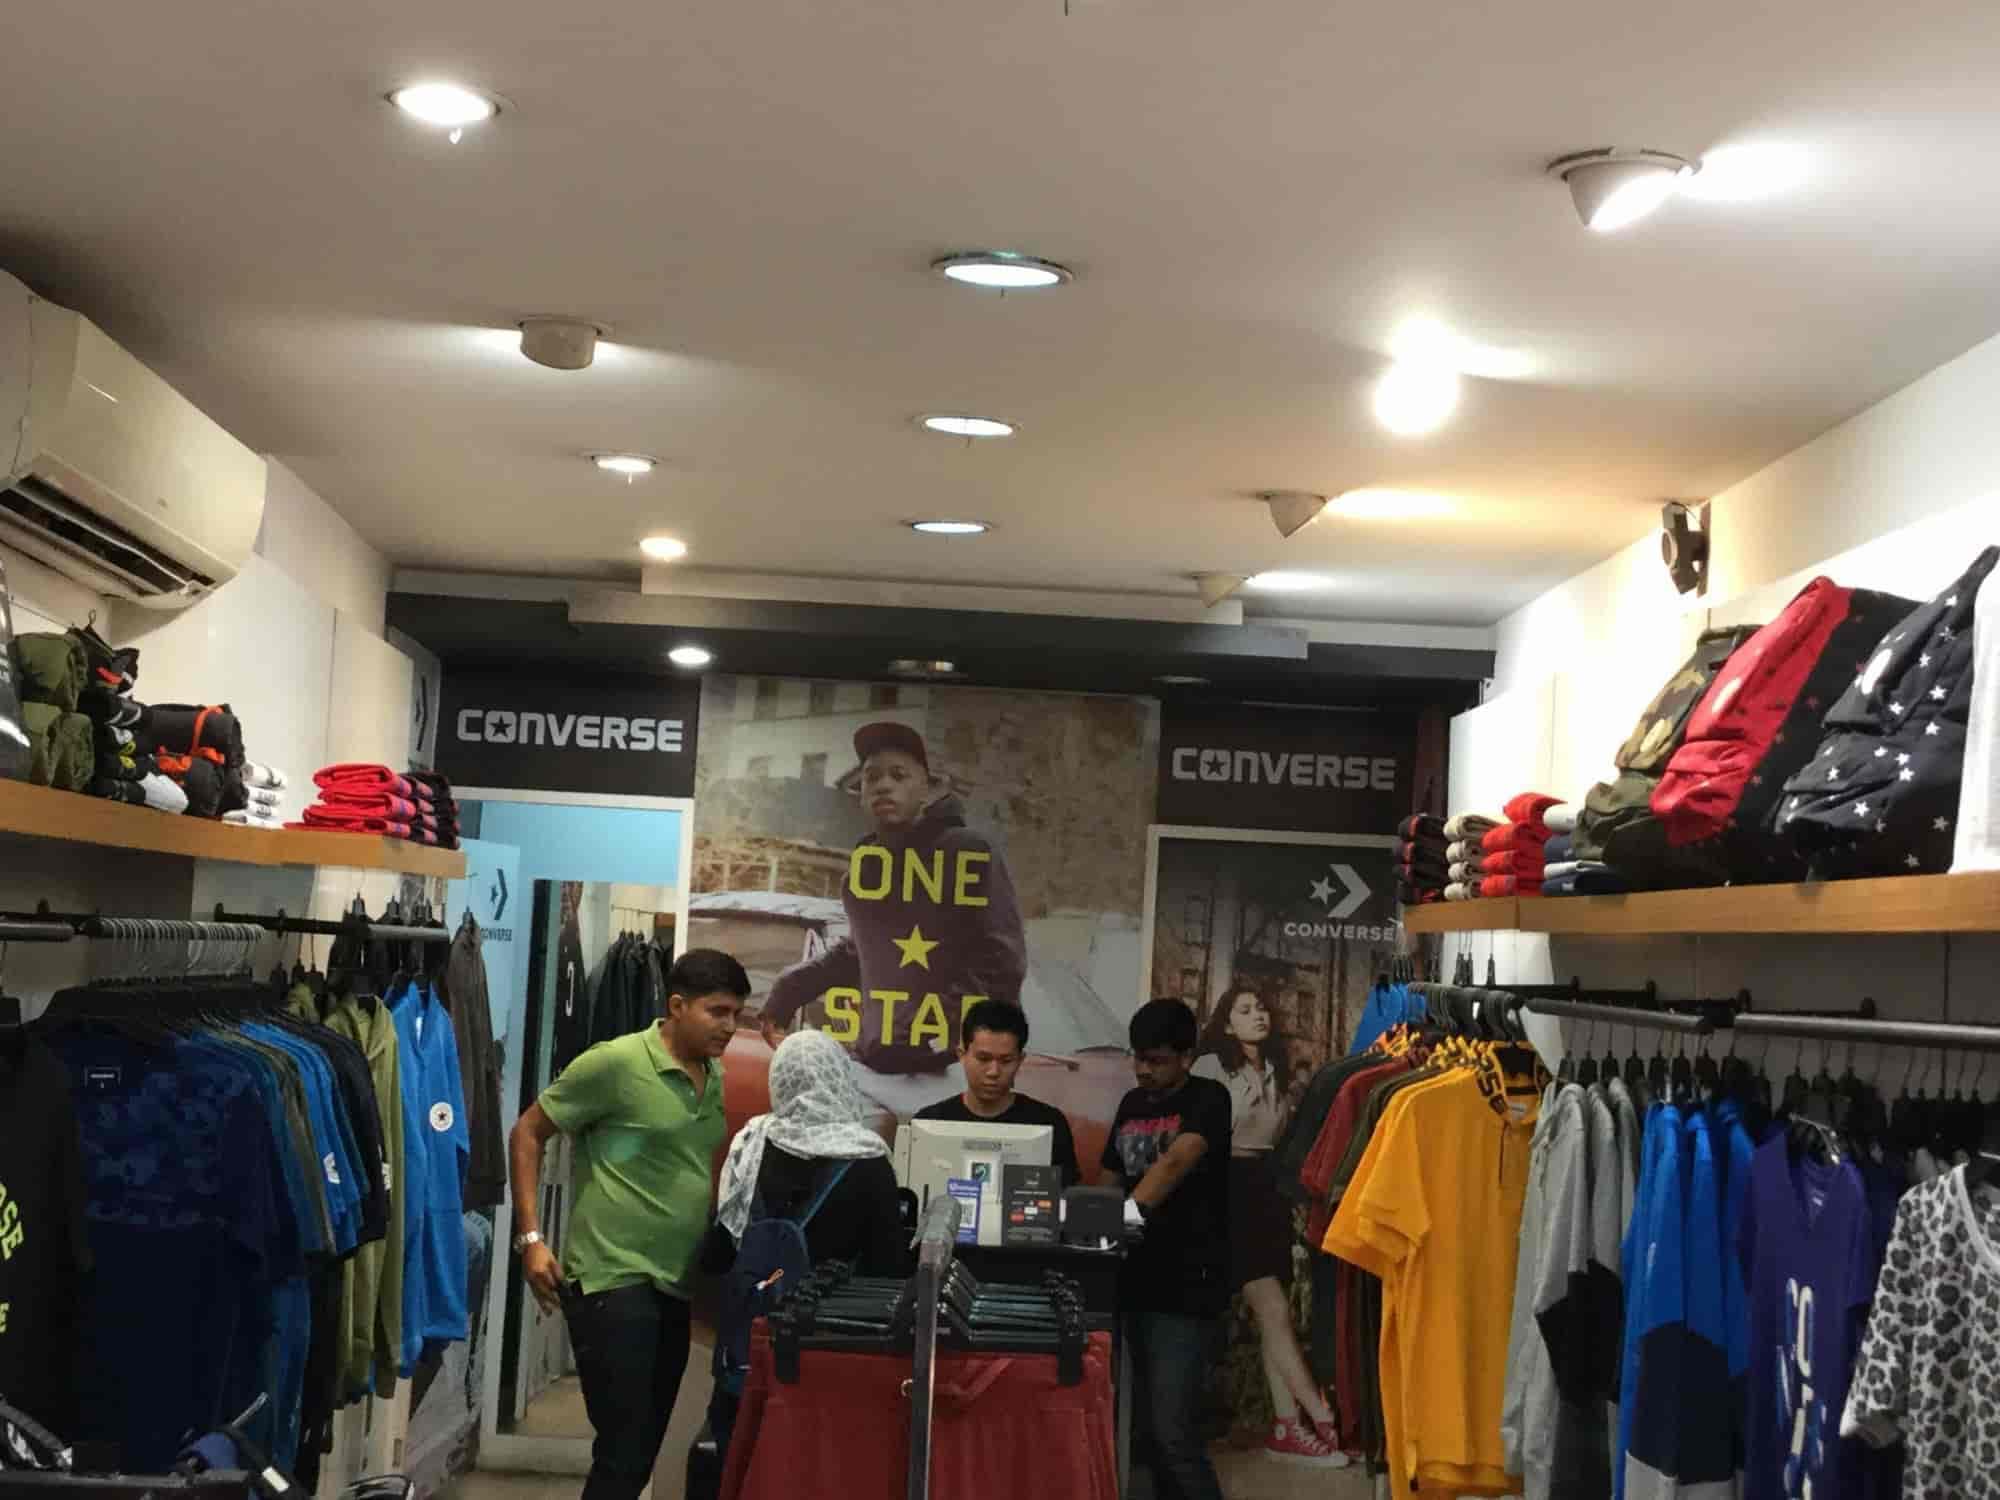 20b77fd9000 Converse, Brigade Road - Shoe Dealers in Bangalore - Justdial